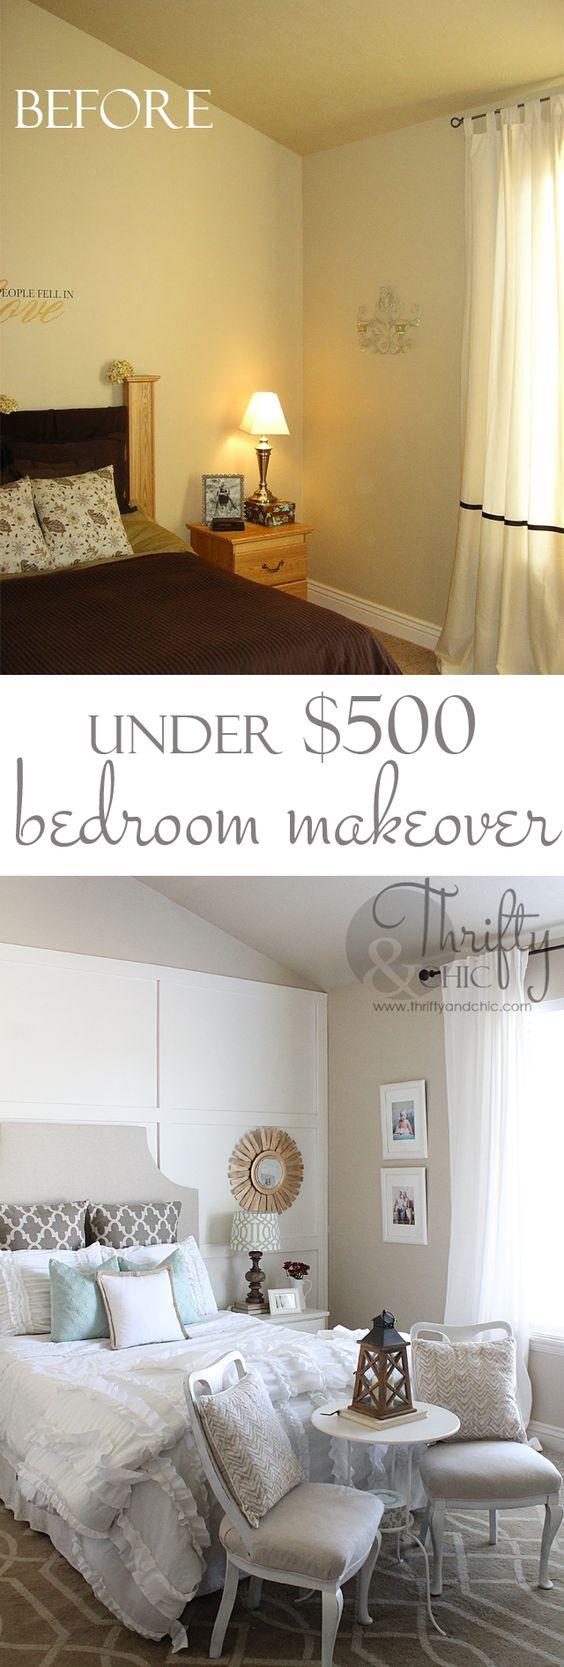 Best Master Bedroom Makeover For Under 500 Great Diy Ideas 400 x 300